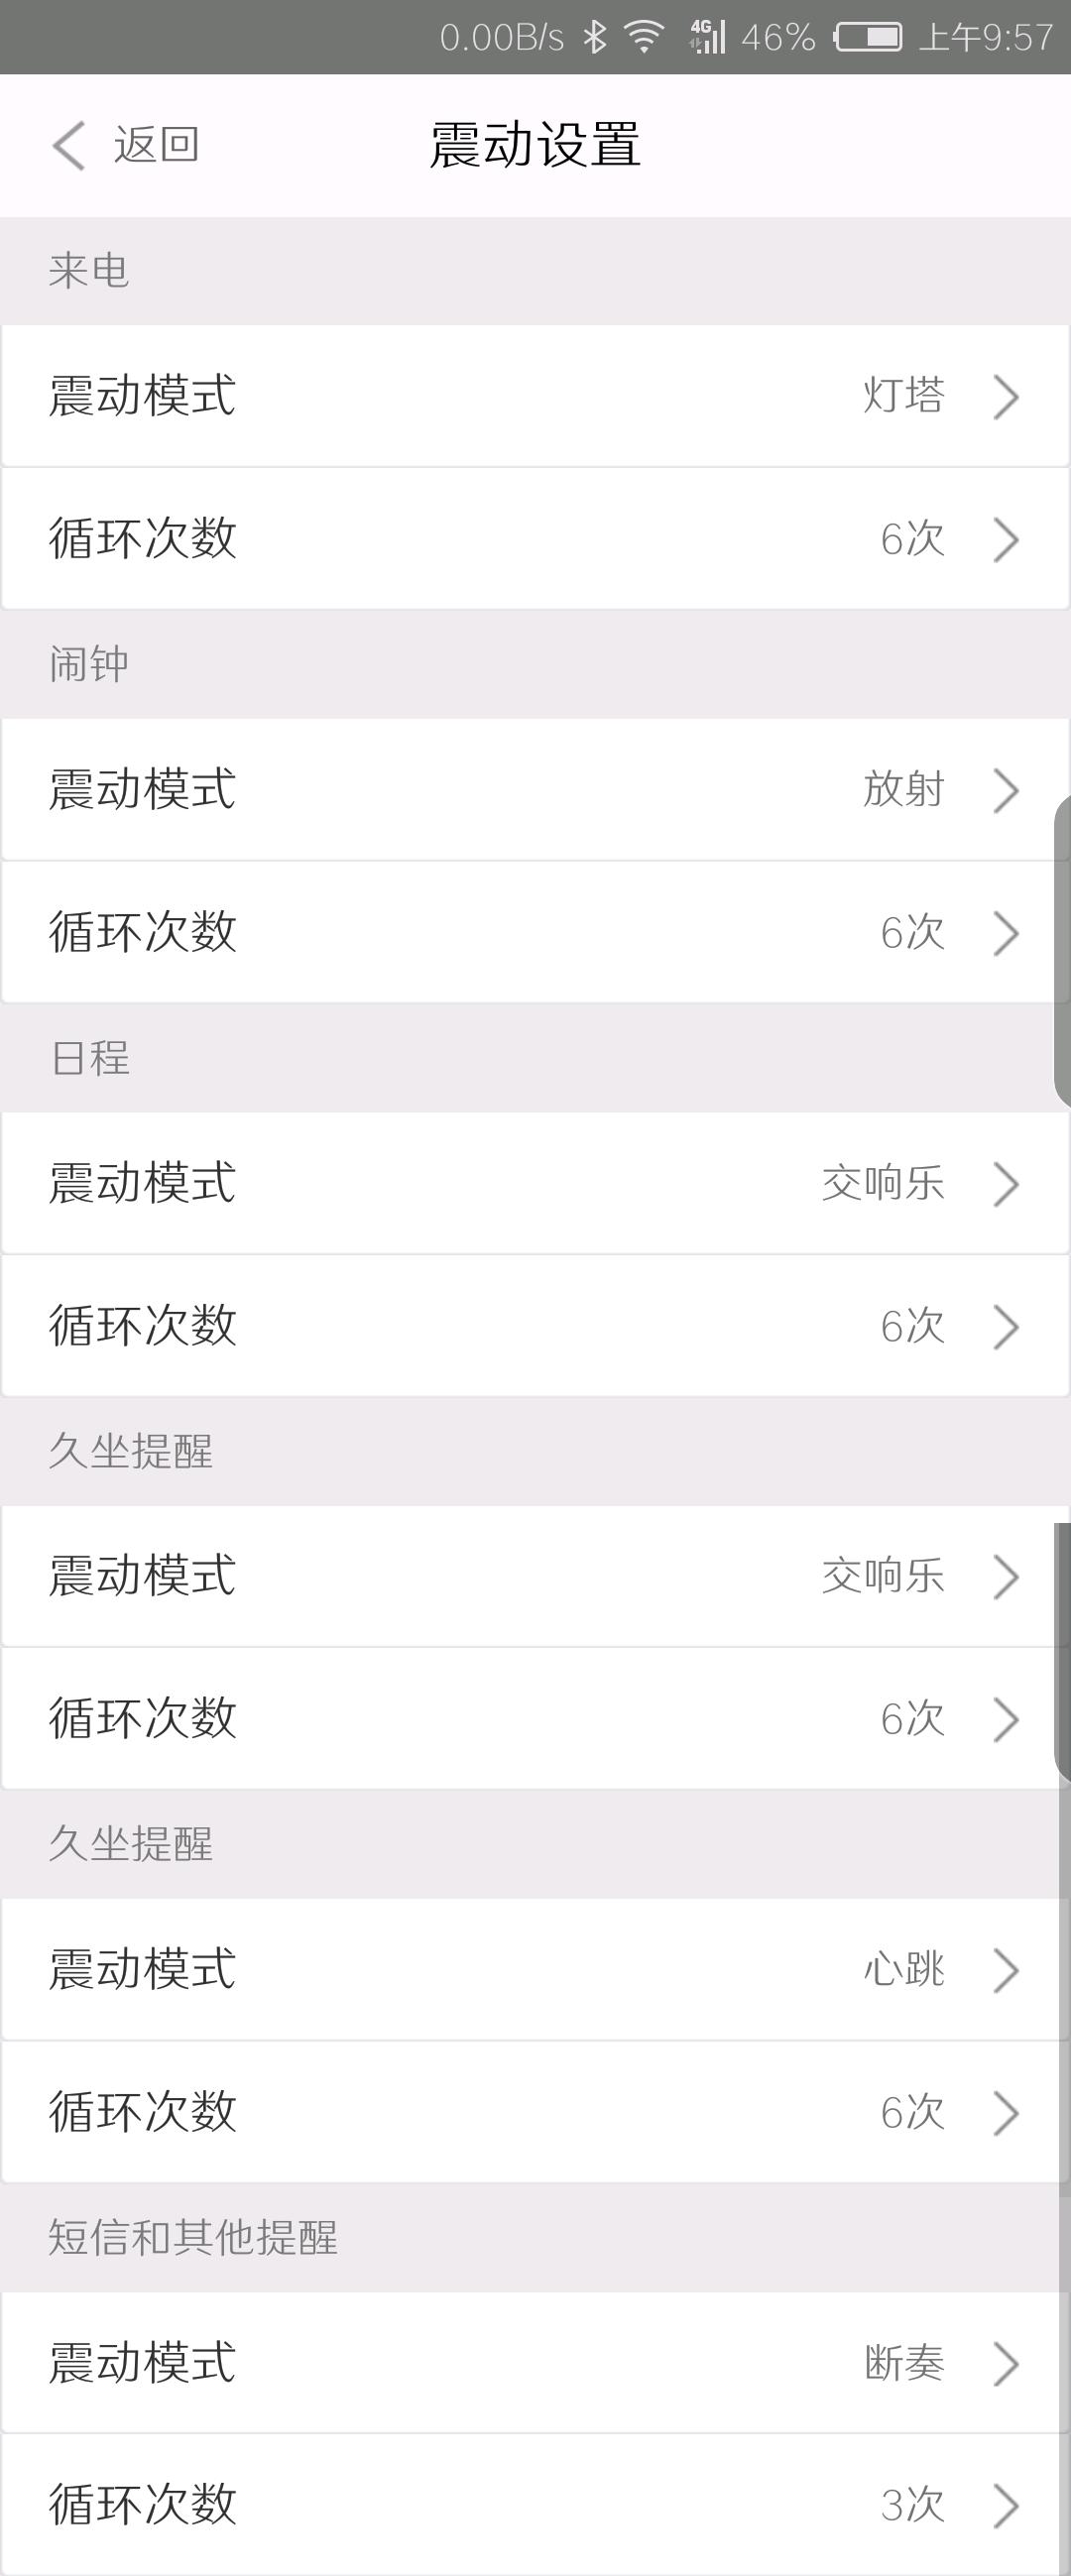 Screenshot_2017-08-17-09-58-05.png